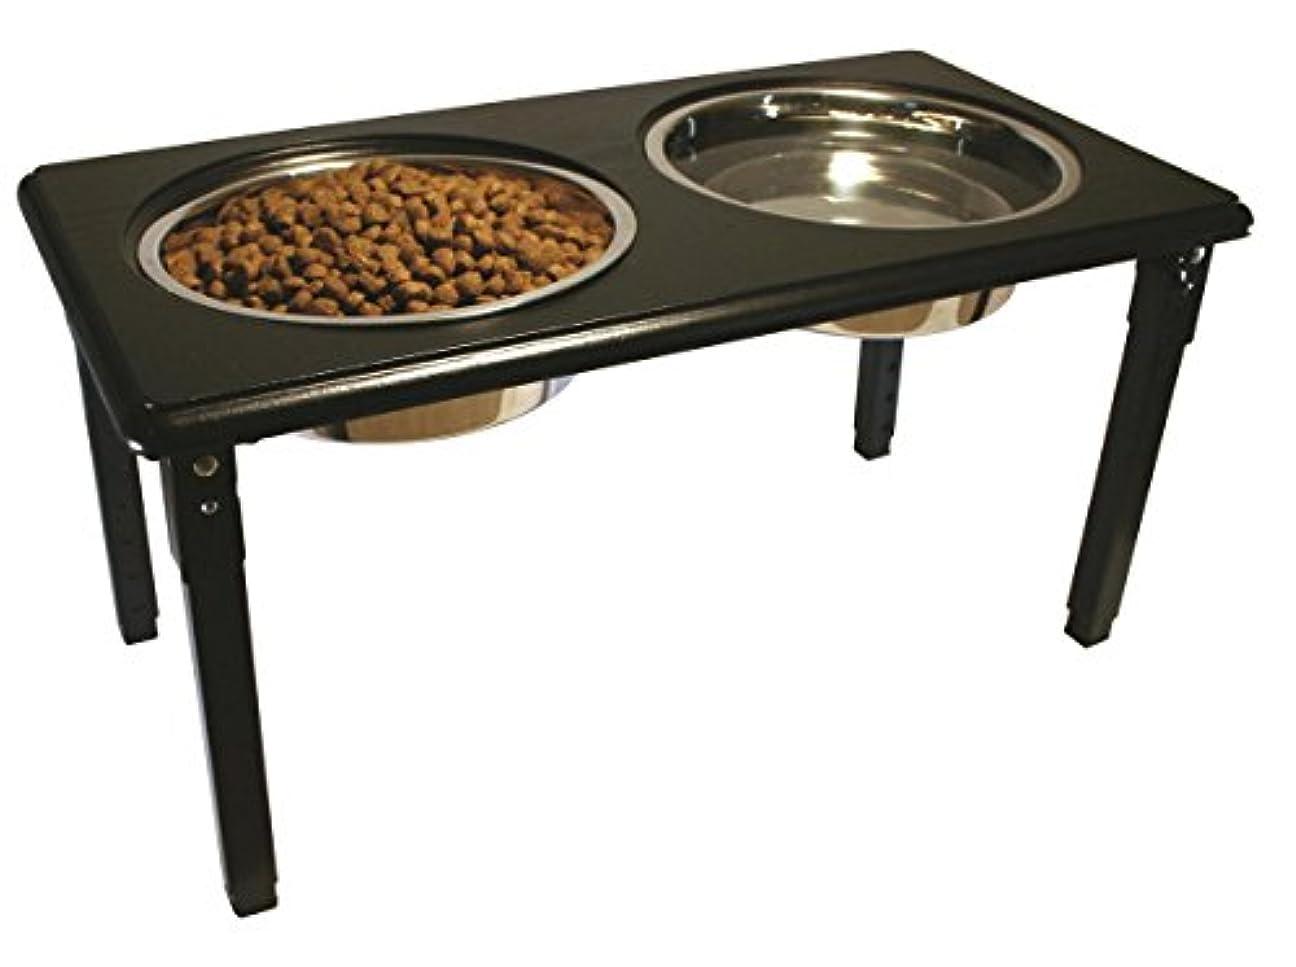 Ethical Pet POSTURE-PRO Adjustable Double Diner, Black, 3-Quart Other ブラック 犬